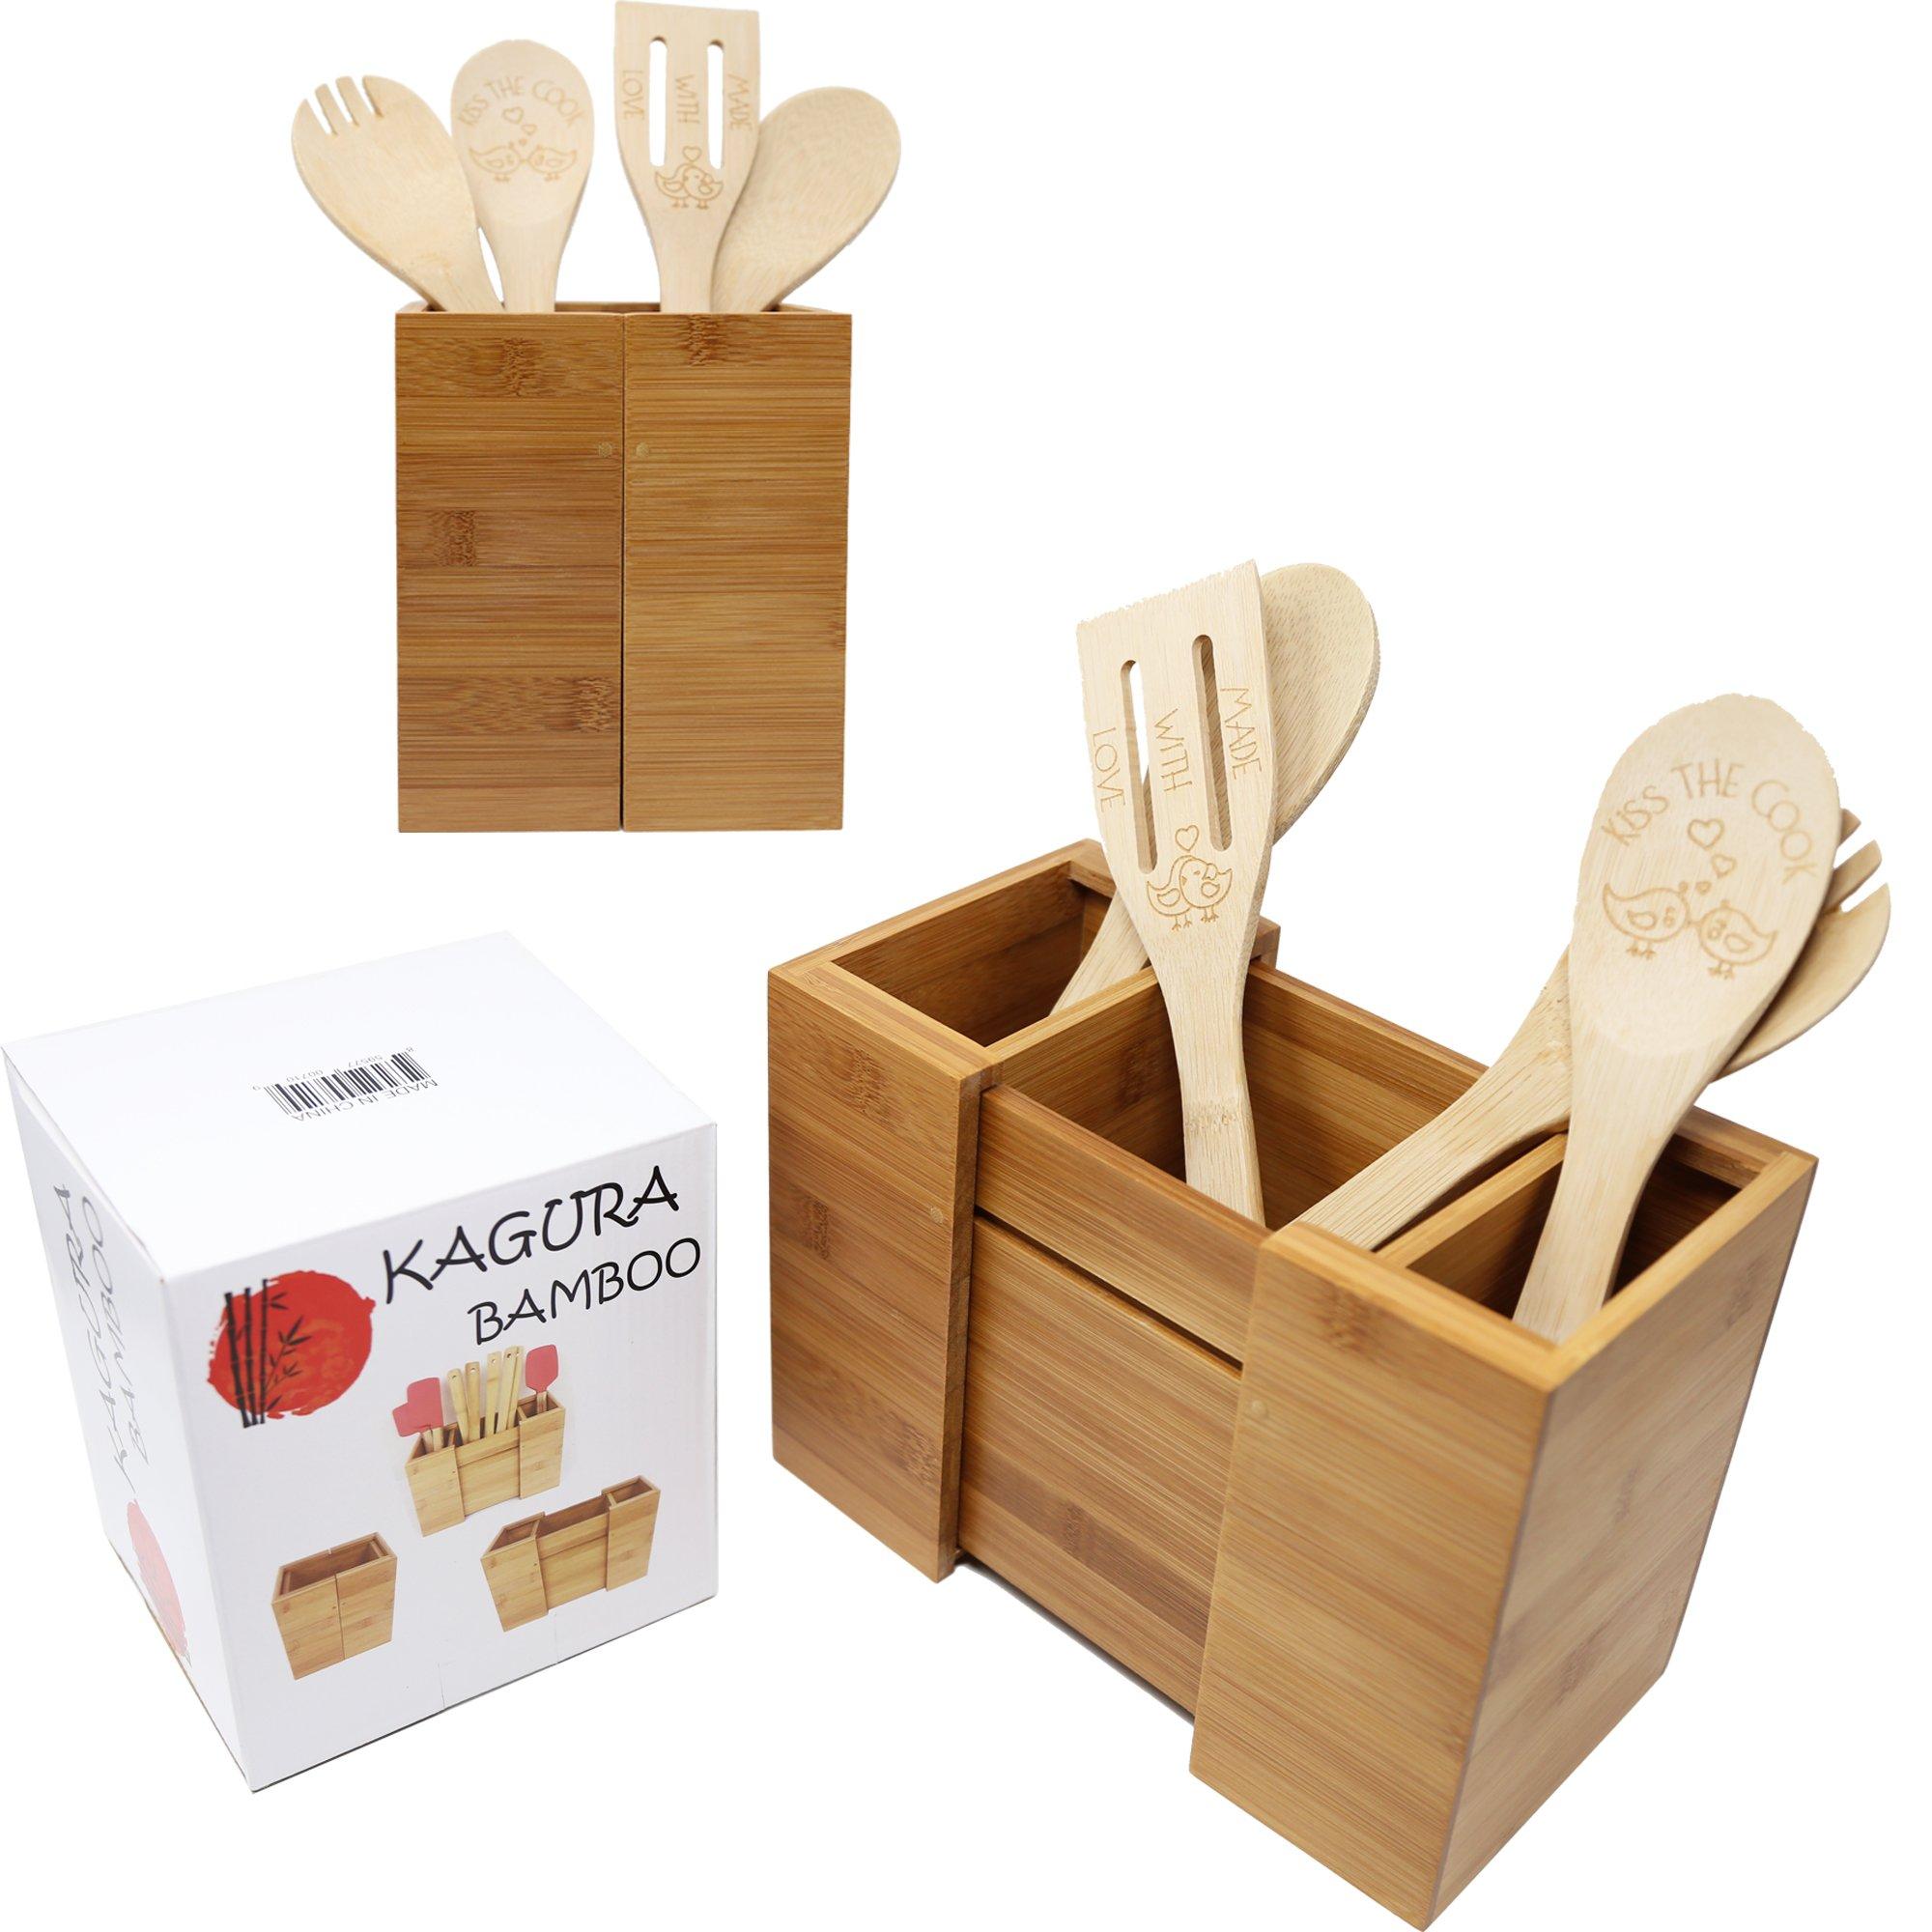 Kagura Bamboo Expandable Utensil Holder Divider Organizer for Kitchen Spatula Caddy Cutlery Silverware Flatware 100% Real-Bamboo Eco-Friendly